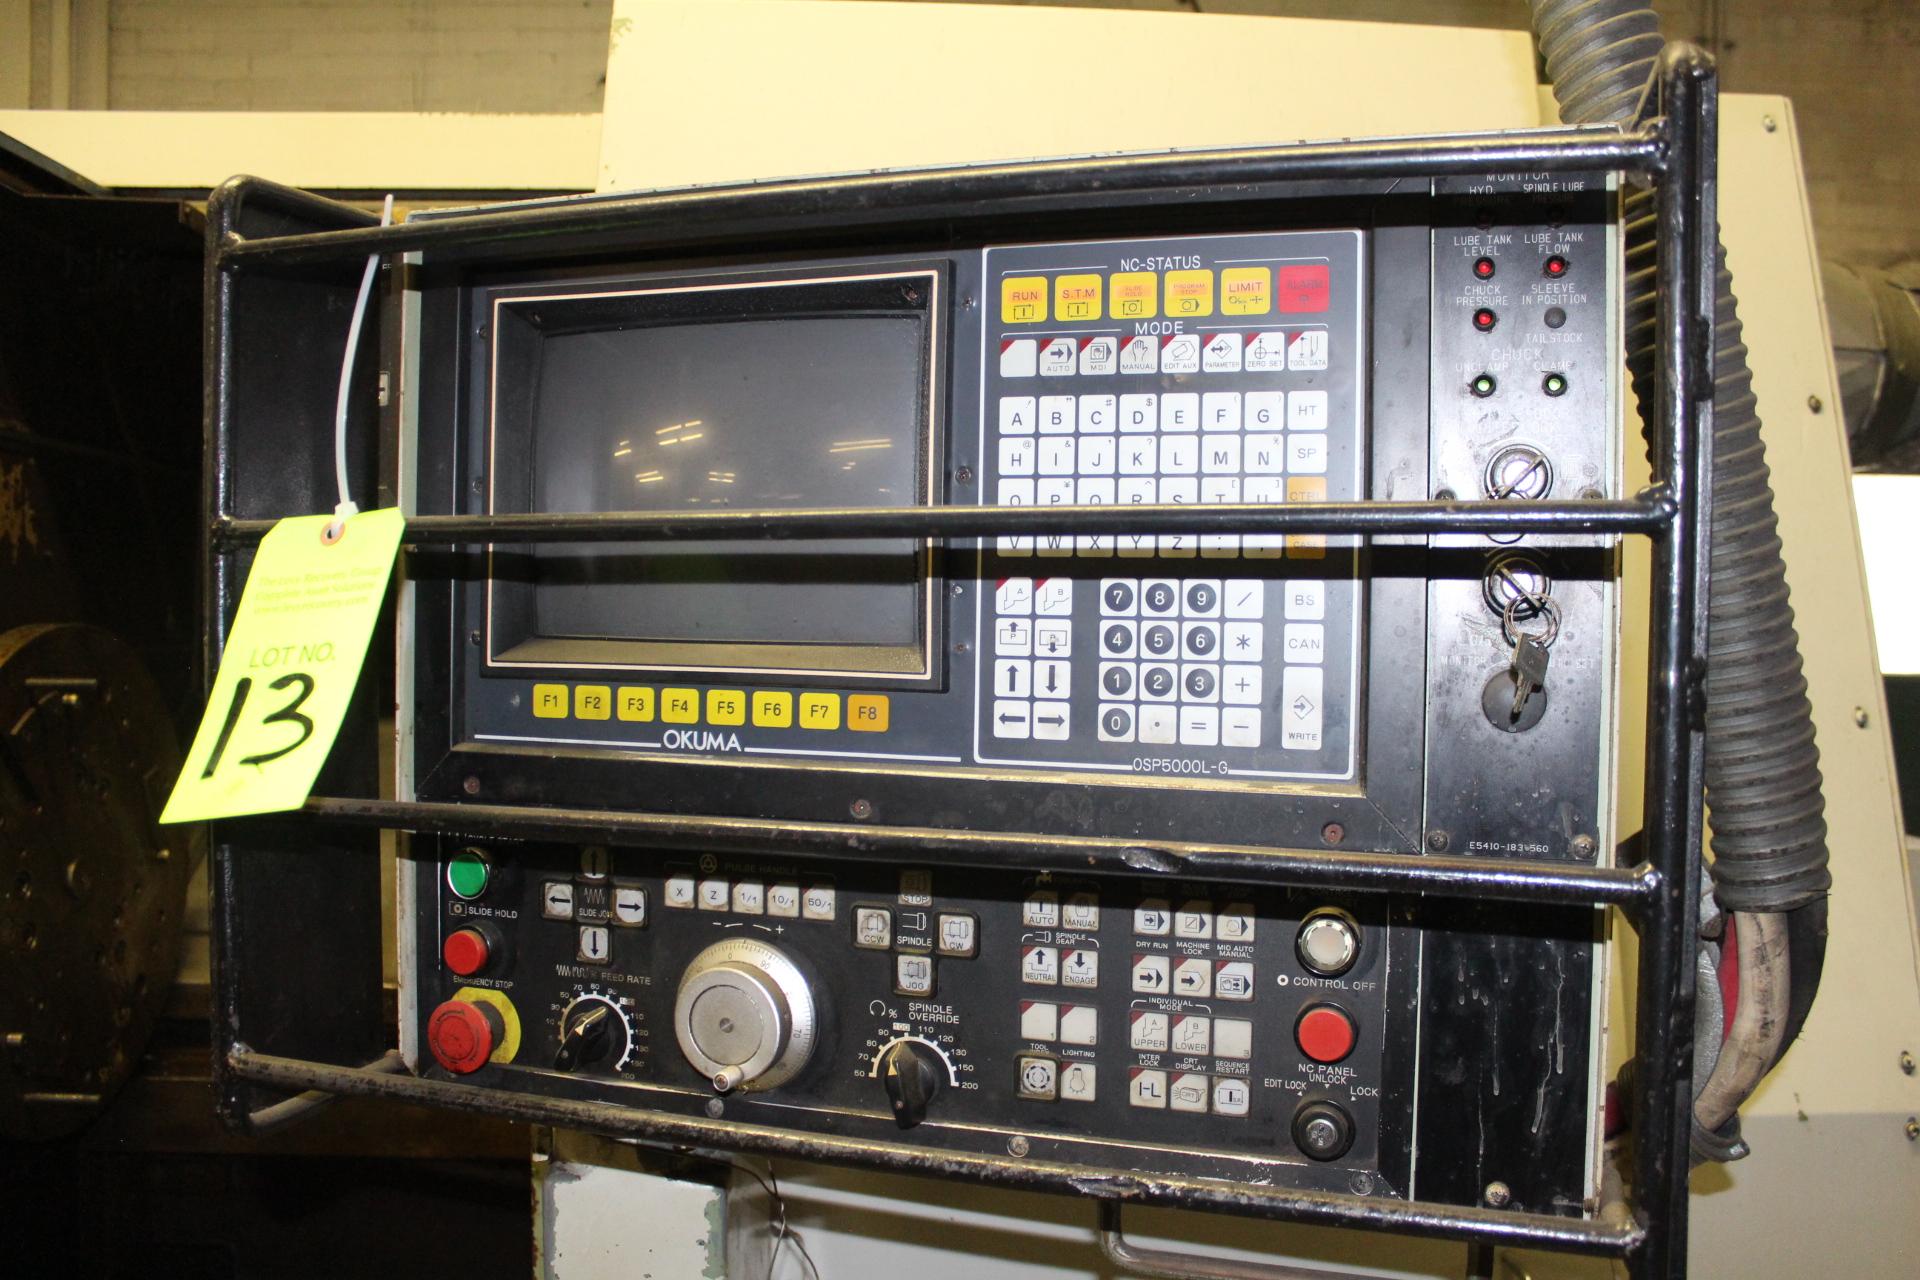 Lot 13 - Okuma LC40 2-Axis CNC Turning Center